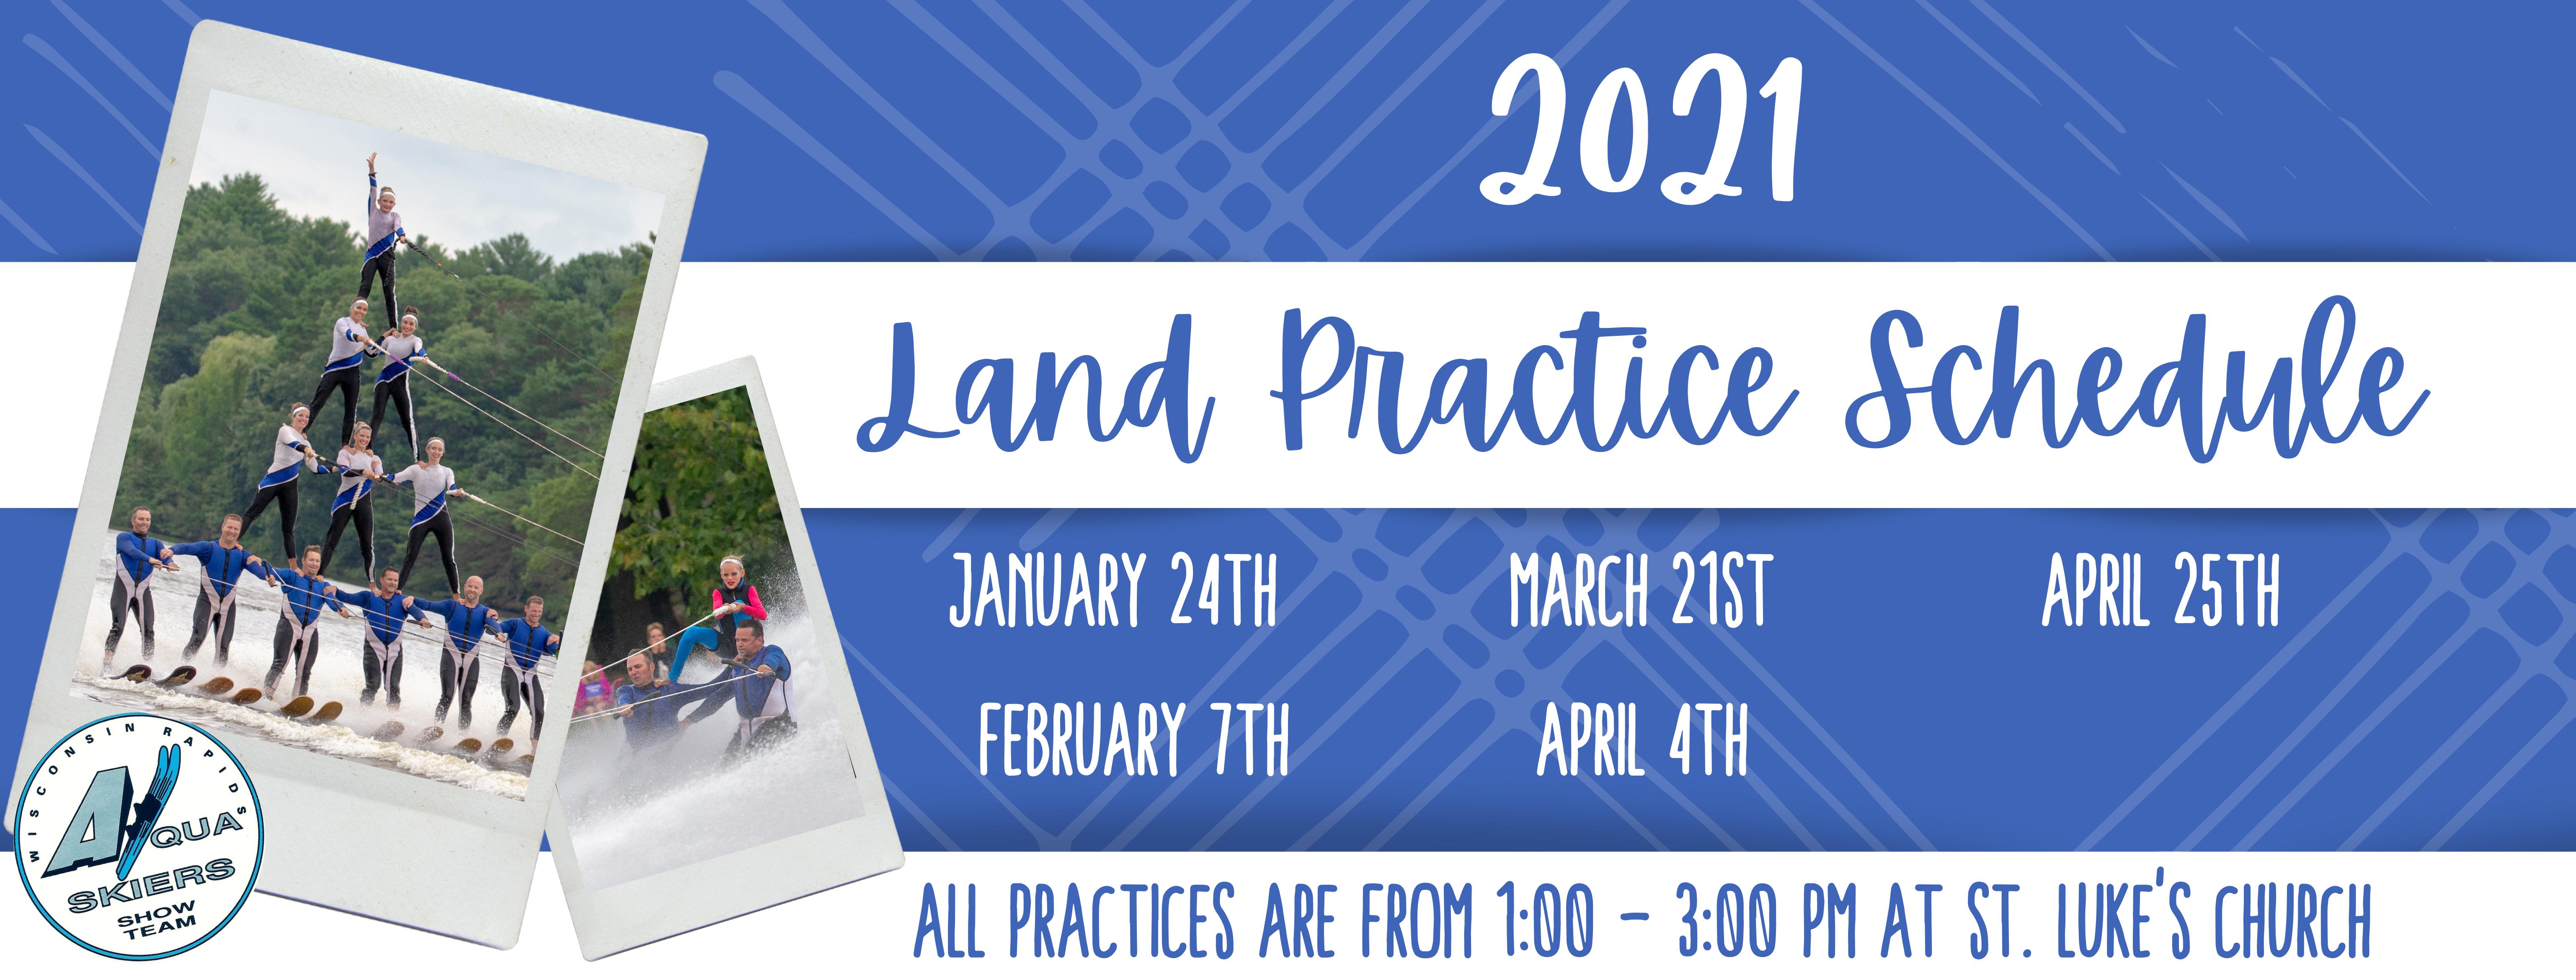 2021 Land Practice Schedule -2